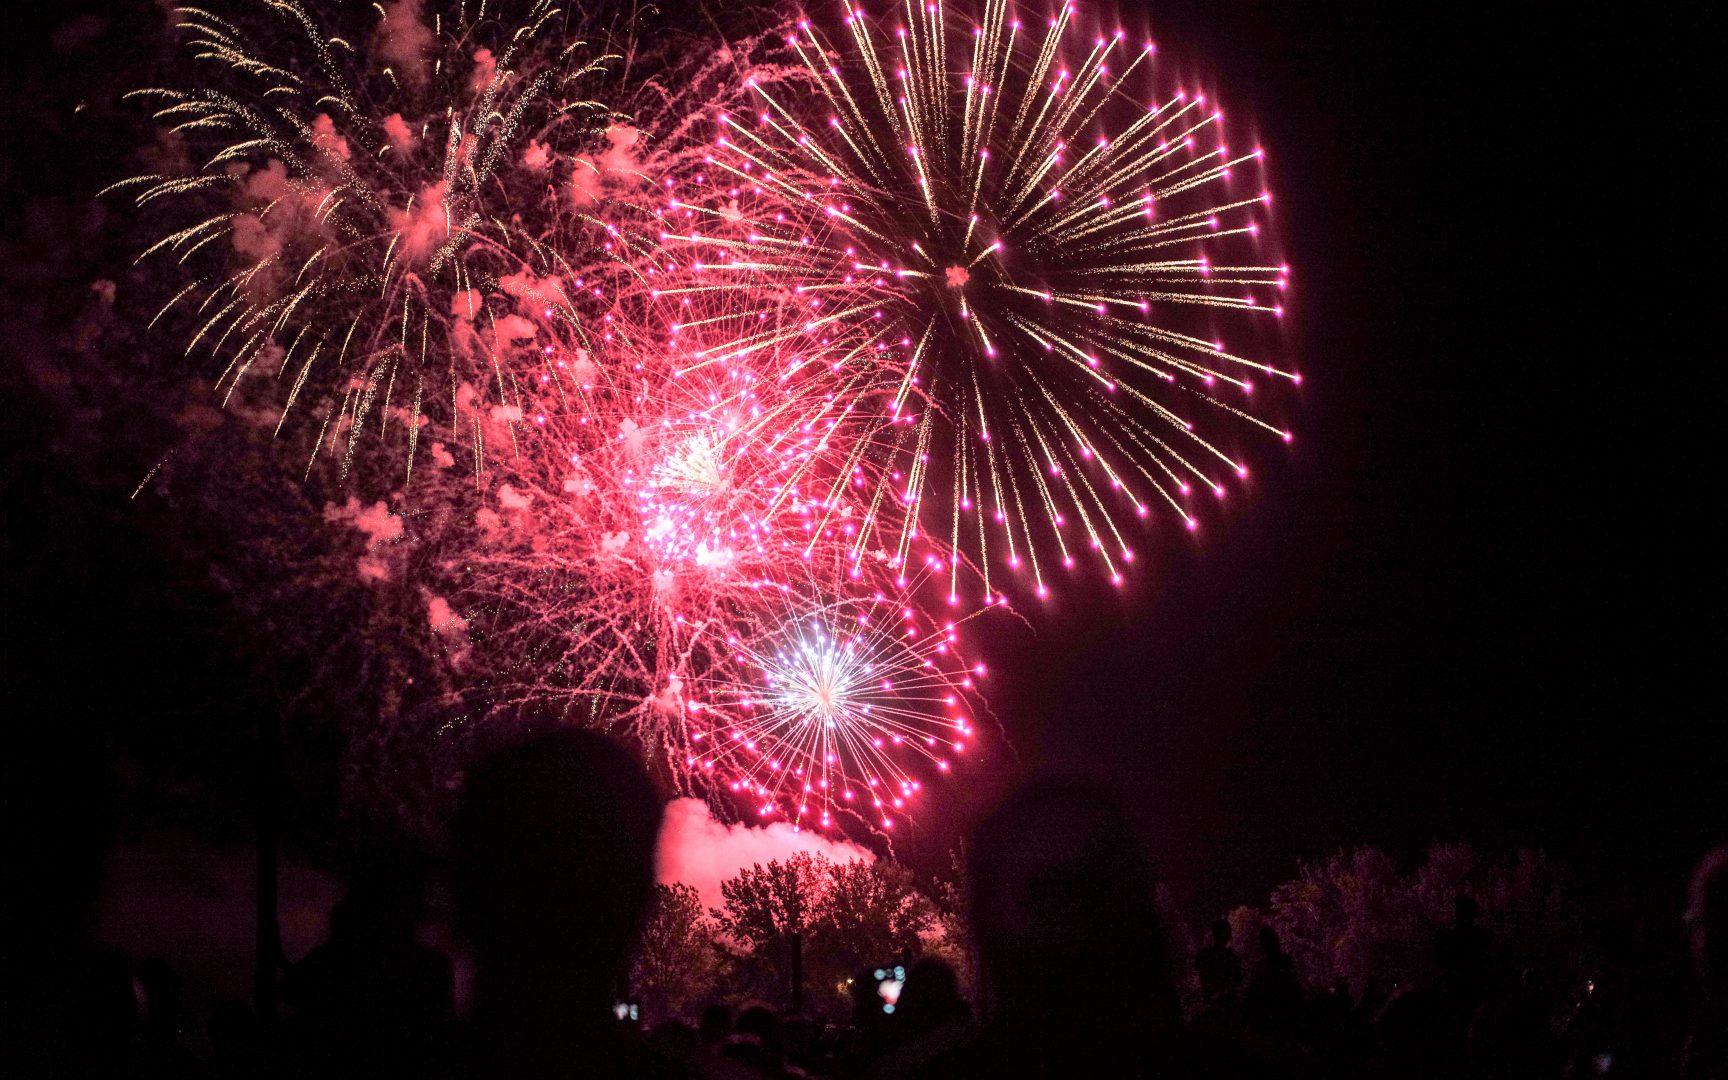 Canada Day Fireworks at Ashbridge's Bay, Photo by Shane Carslake